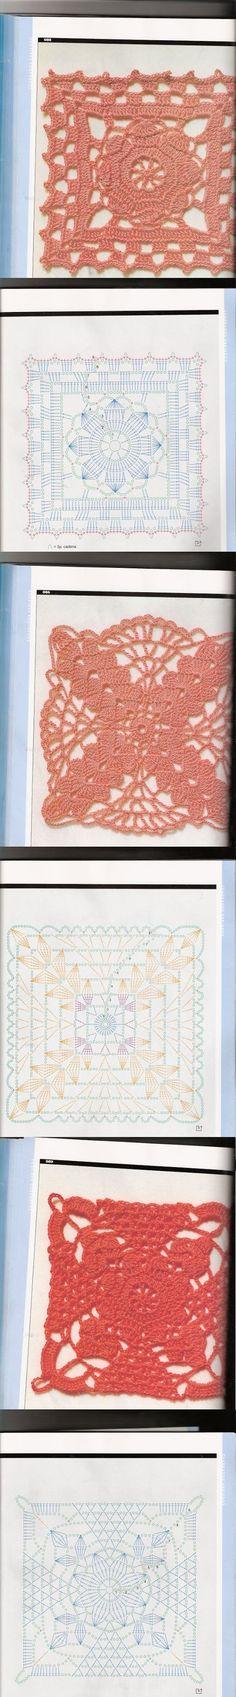 Granny Square häkeln - crochet ♥  #stitch #crochet #pattern #patron #unit